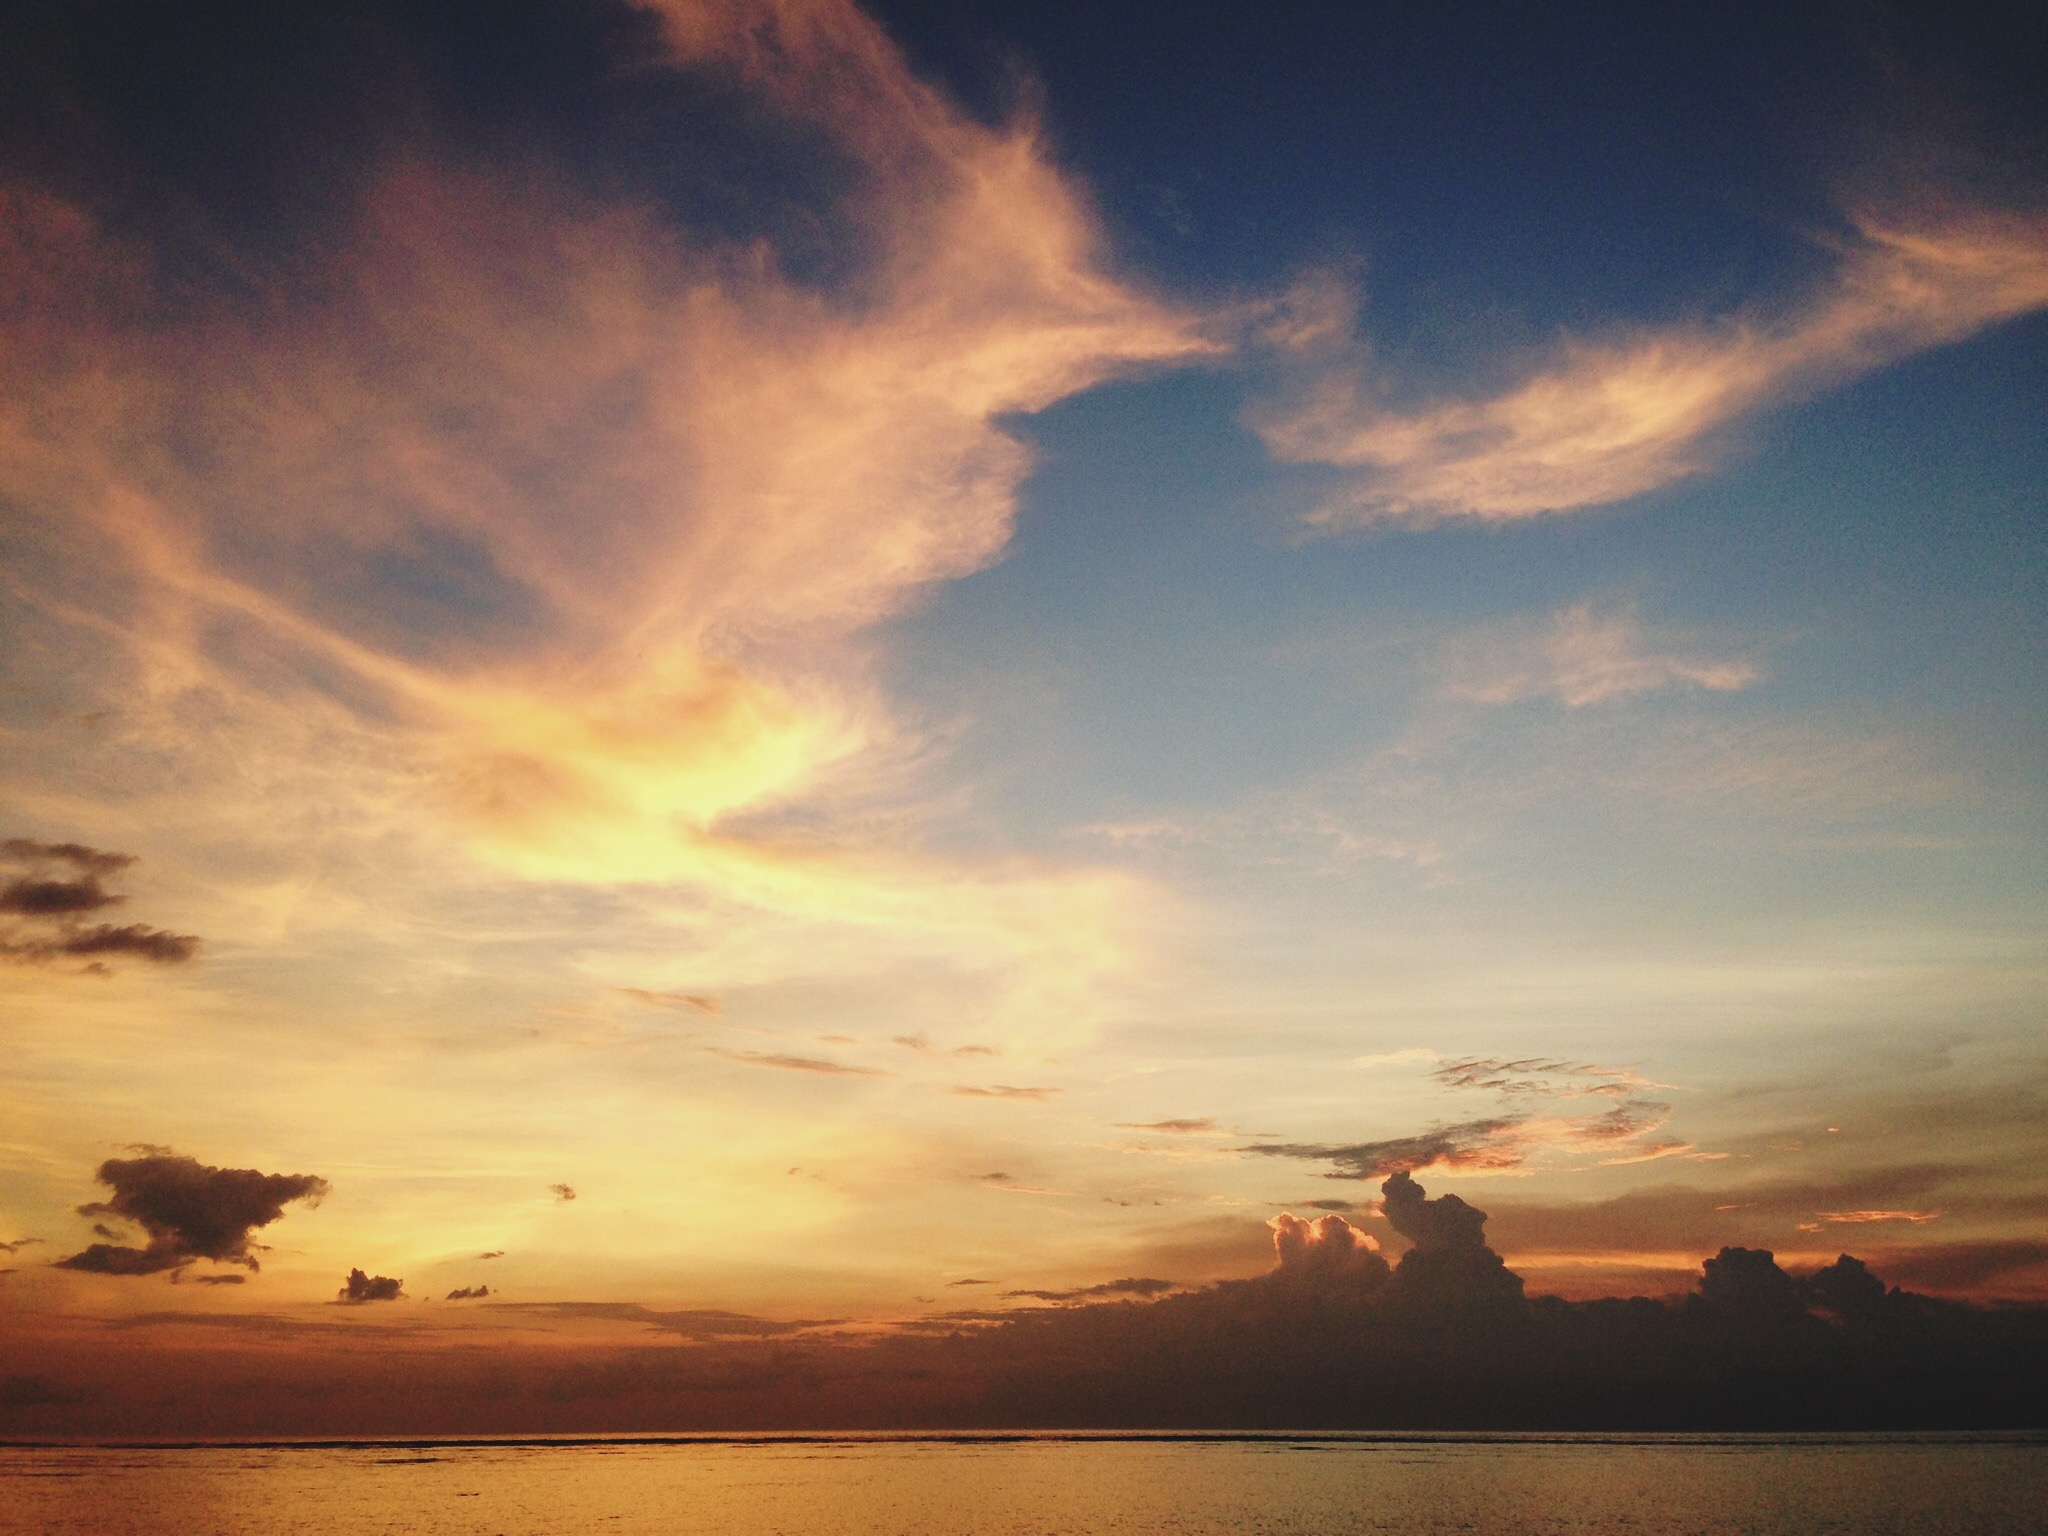 sunset-gili-air.JPG